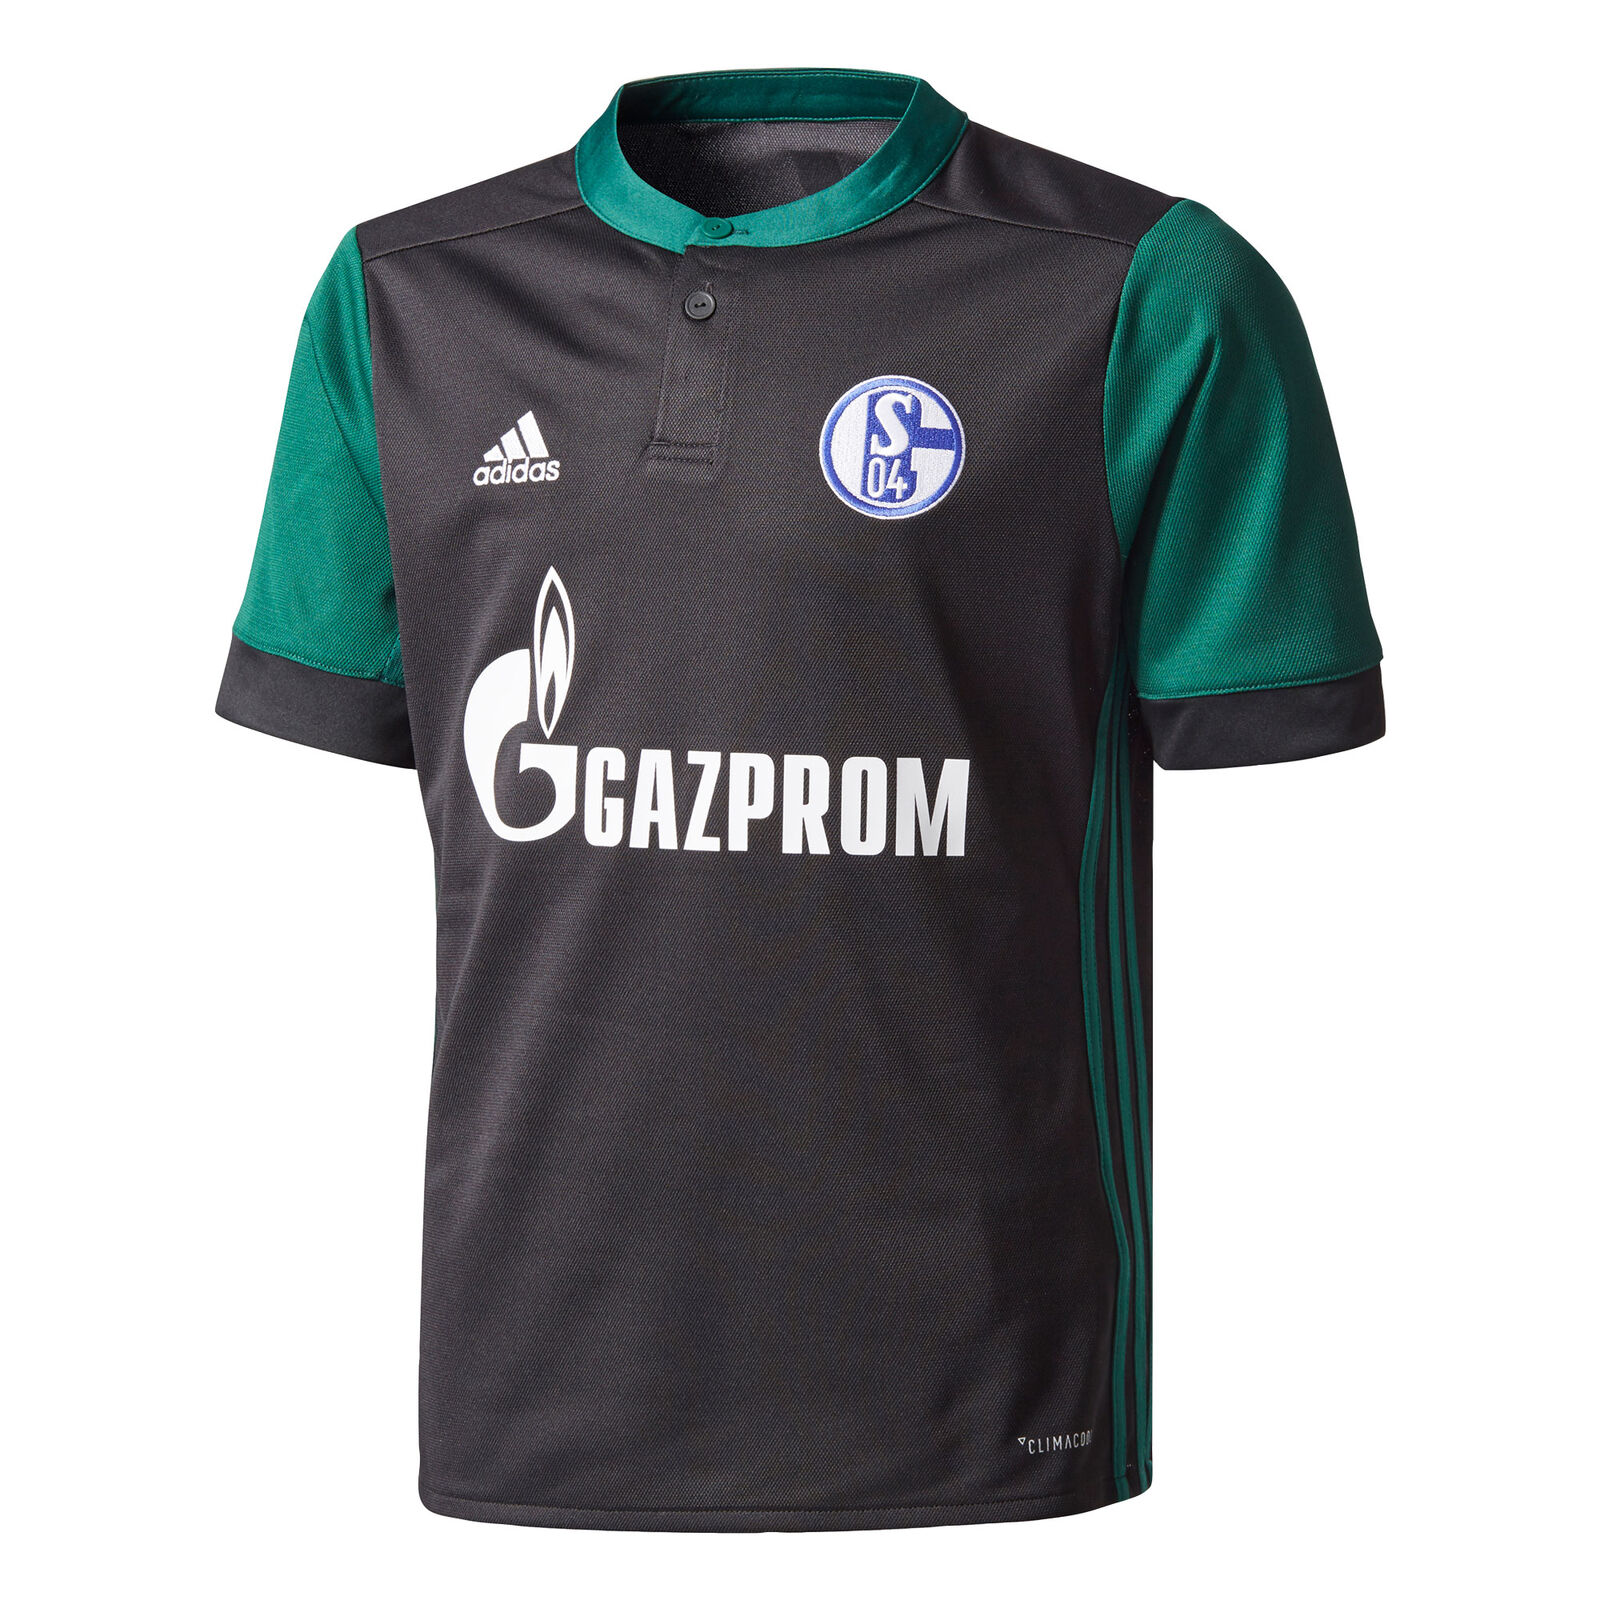 Schalke 04 04 04 Fußball Third Shirt Trikot 2017-18 Kinder adidas 8ec566